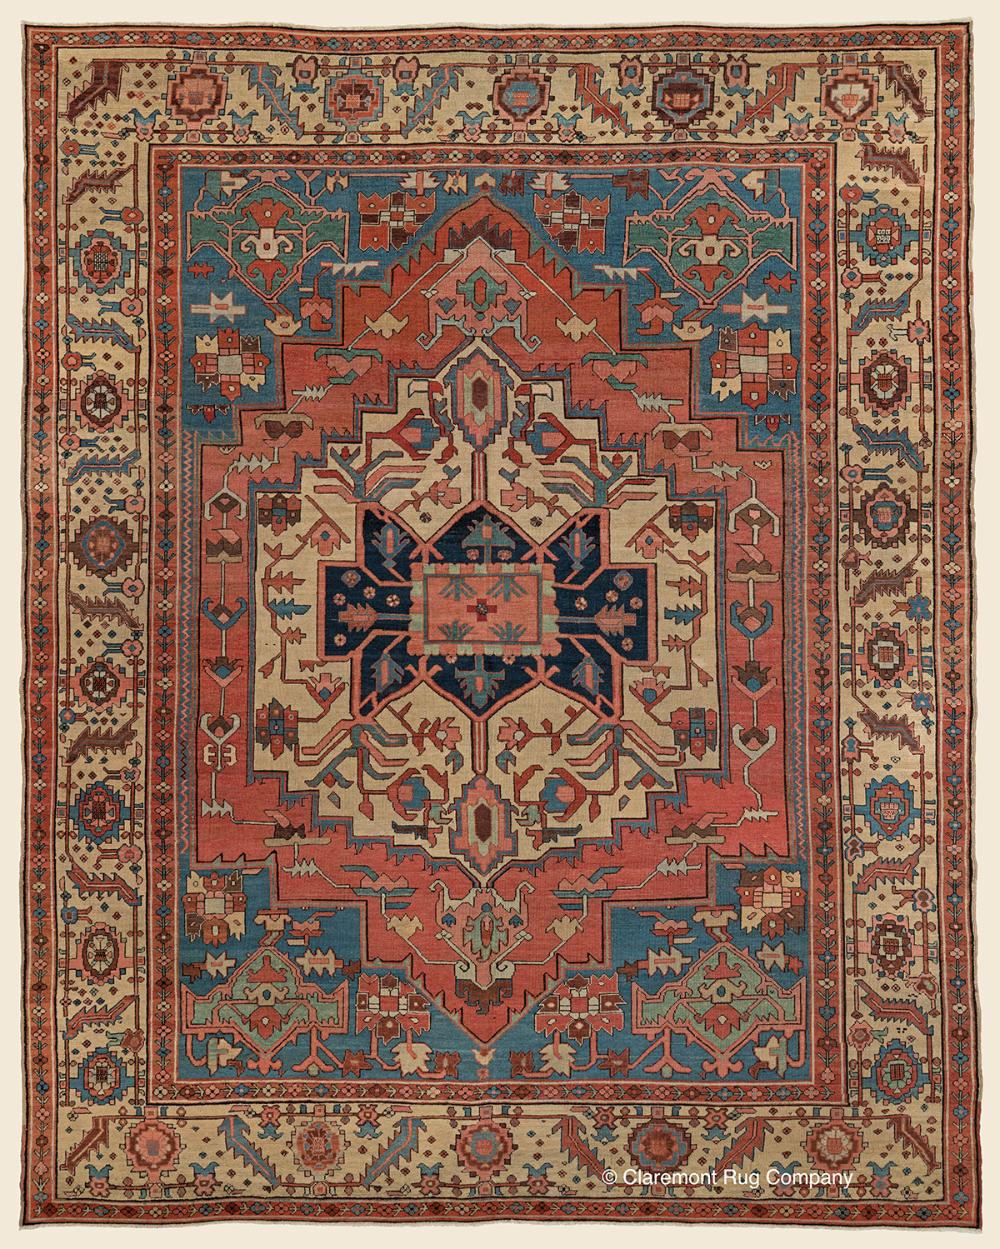 Sold Antique 19th Century Persian Serapi Geometric Medallion High